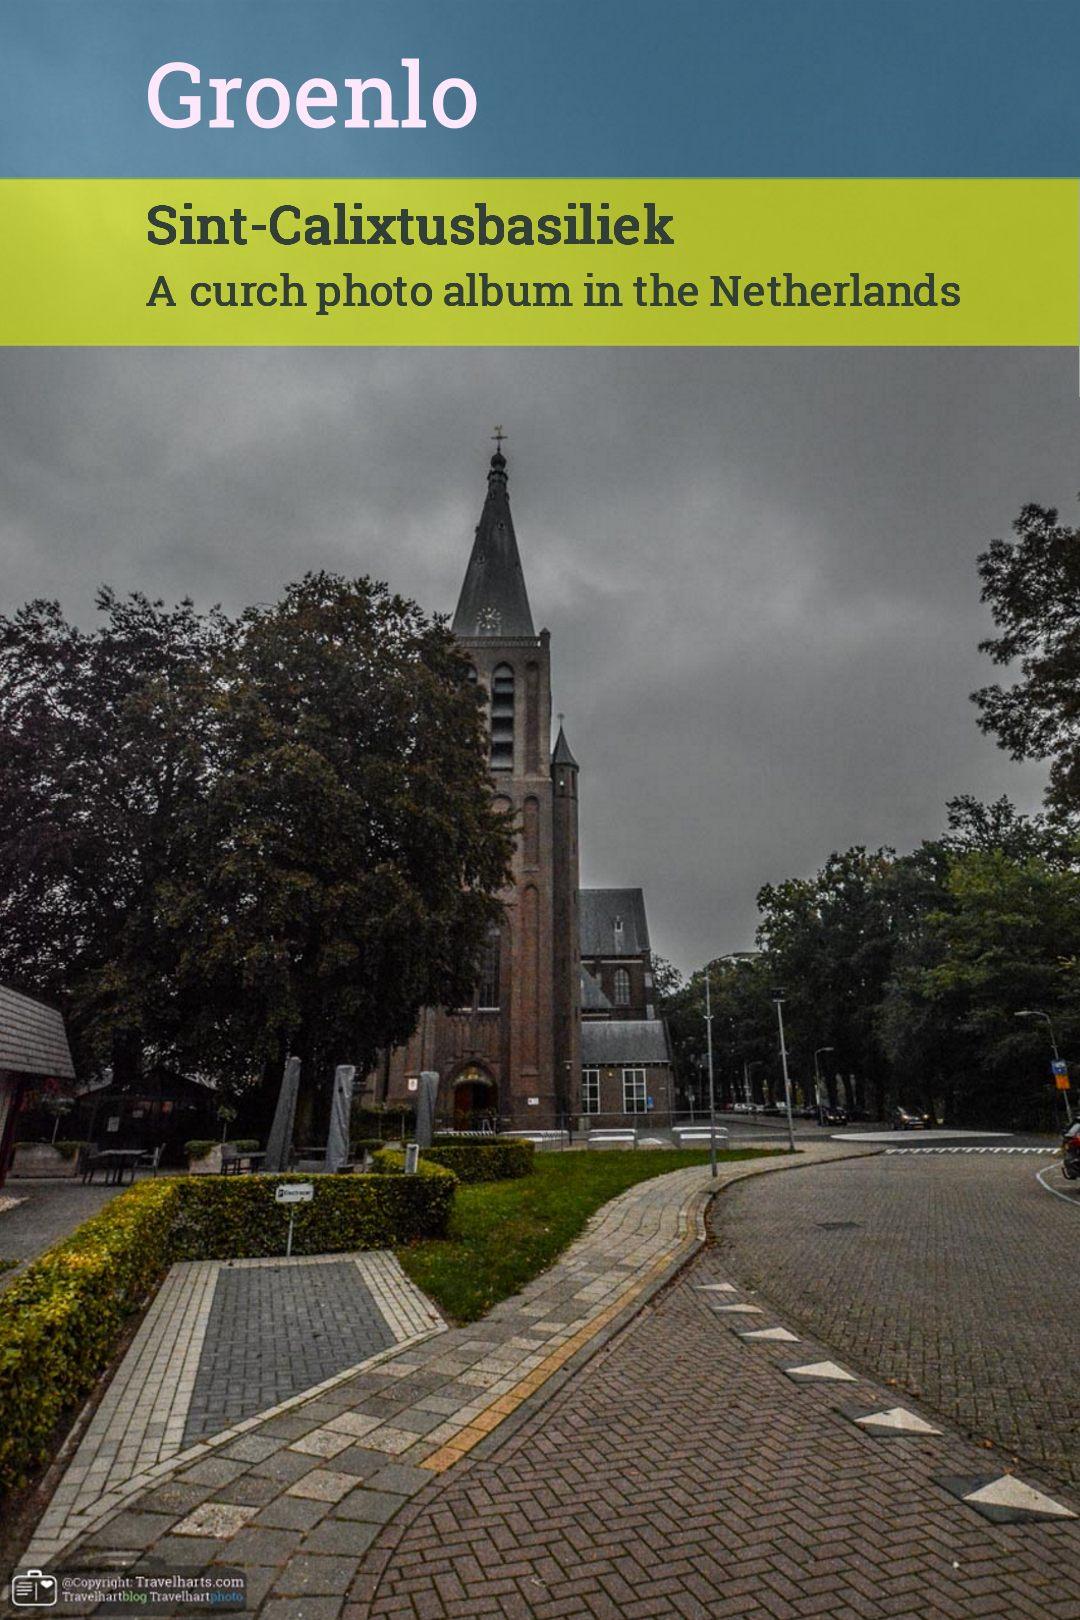 Groenlo, Sint Calixtusbasiliek